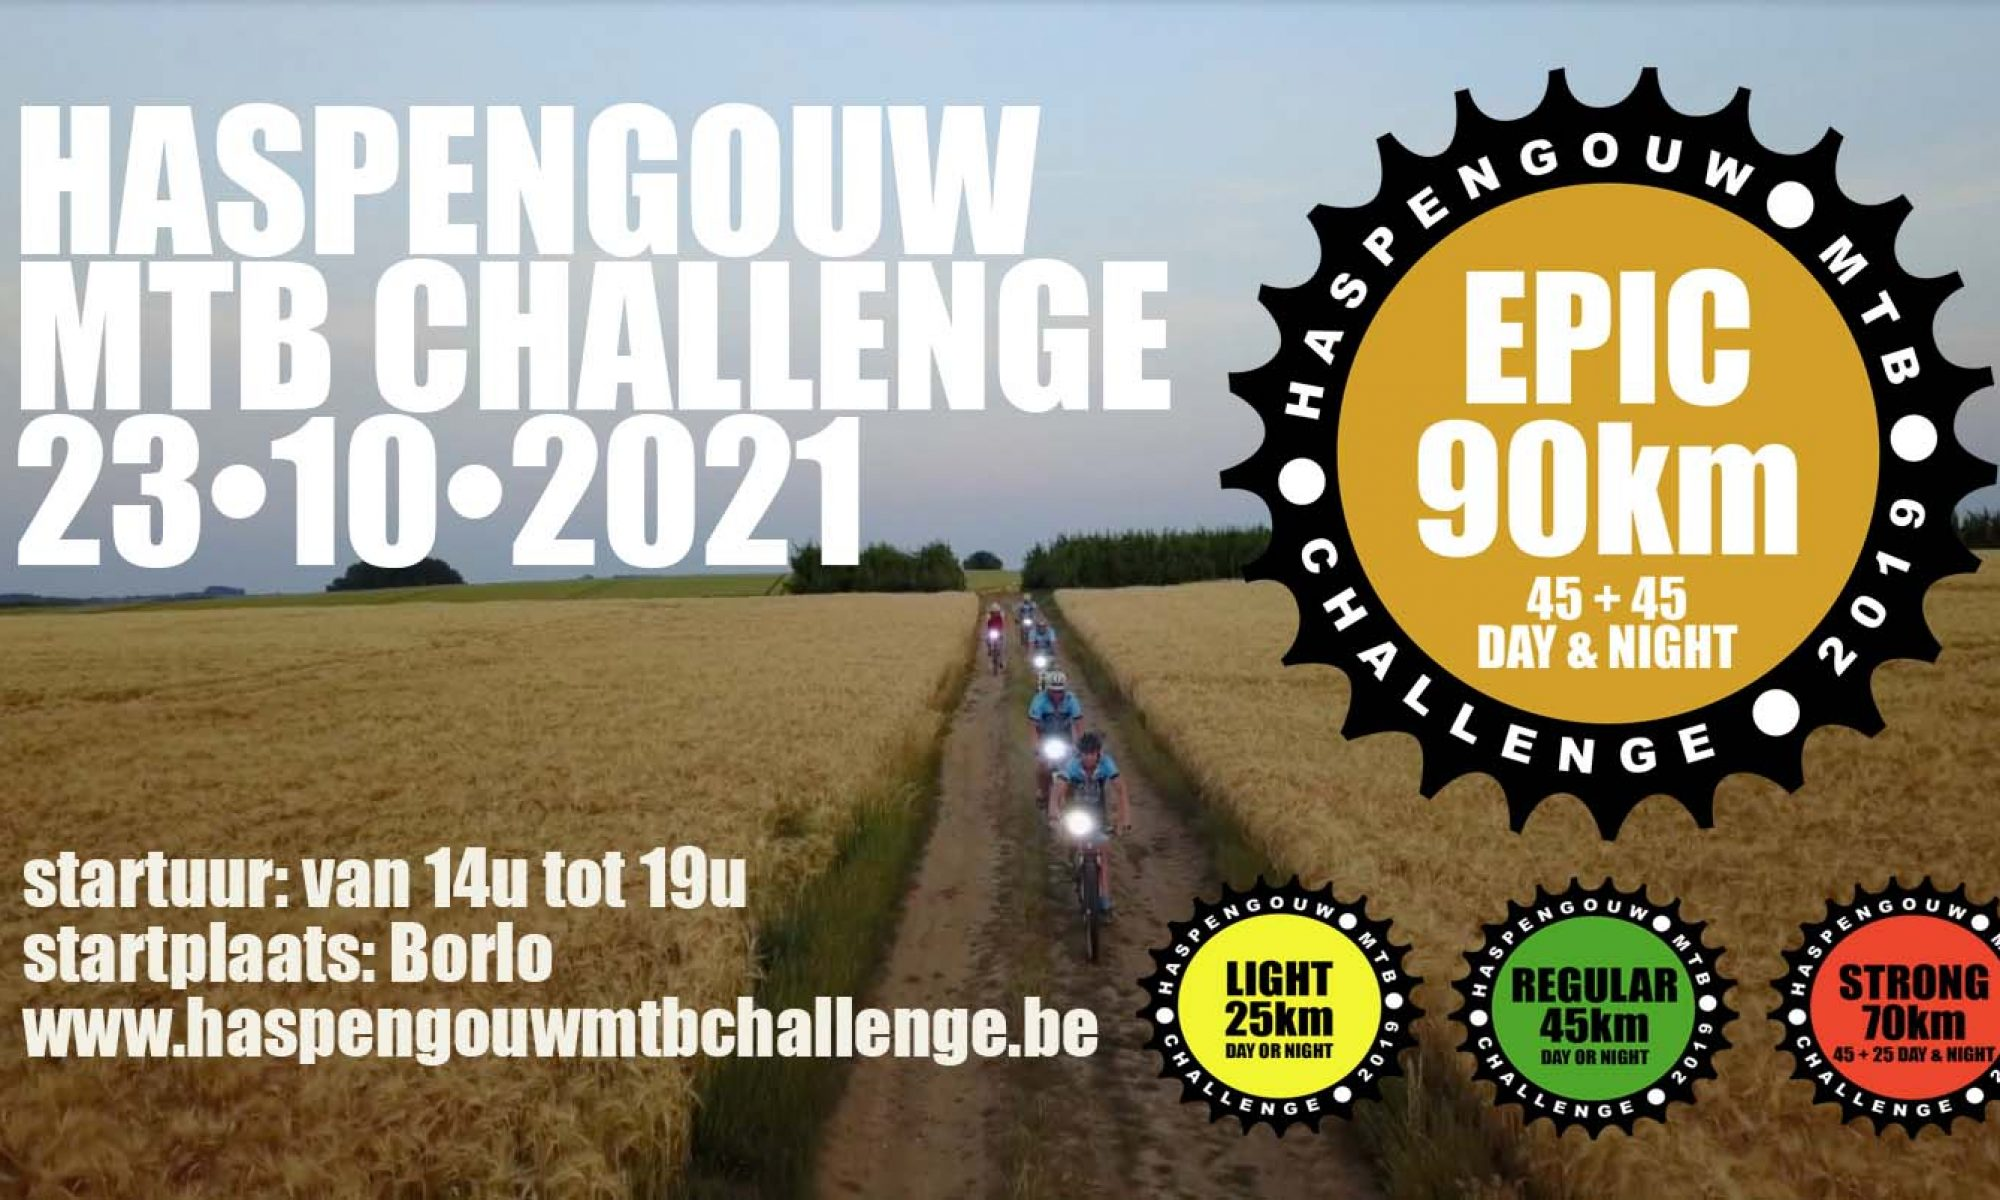 Haspengouw mtb challenge